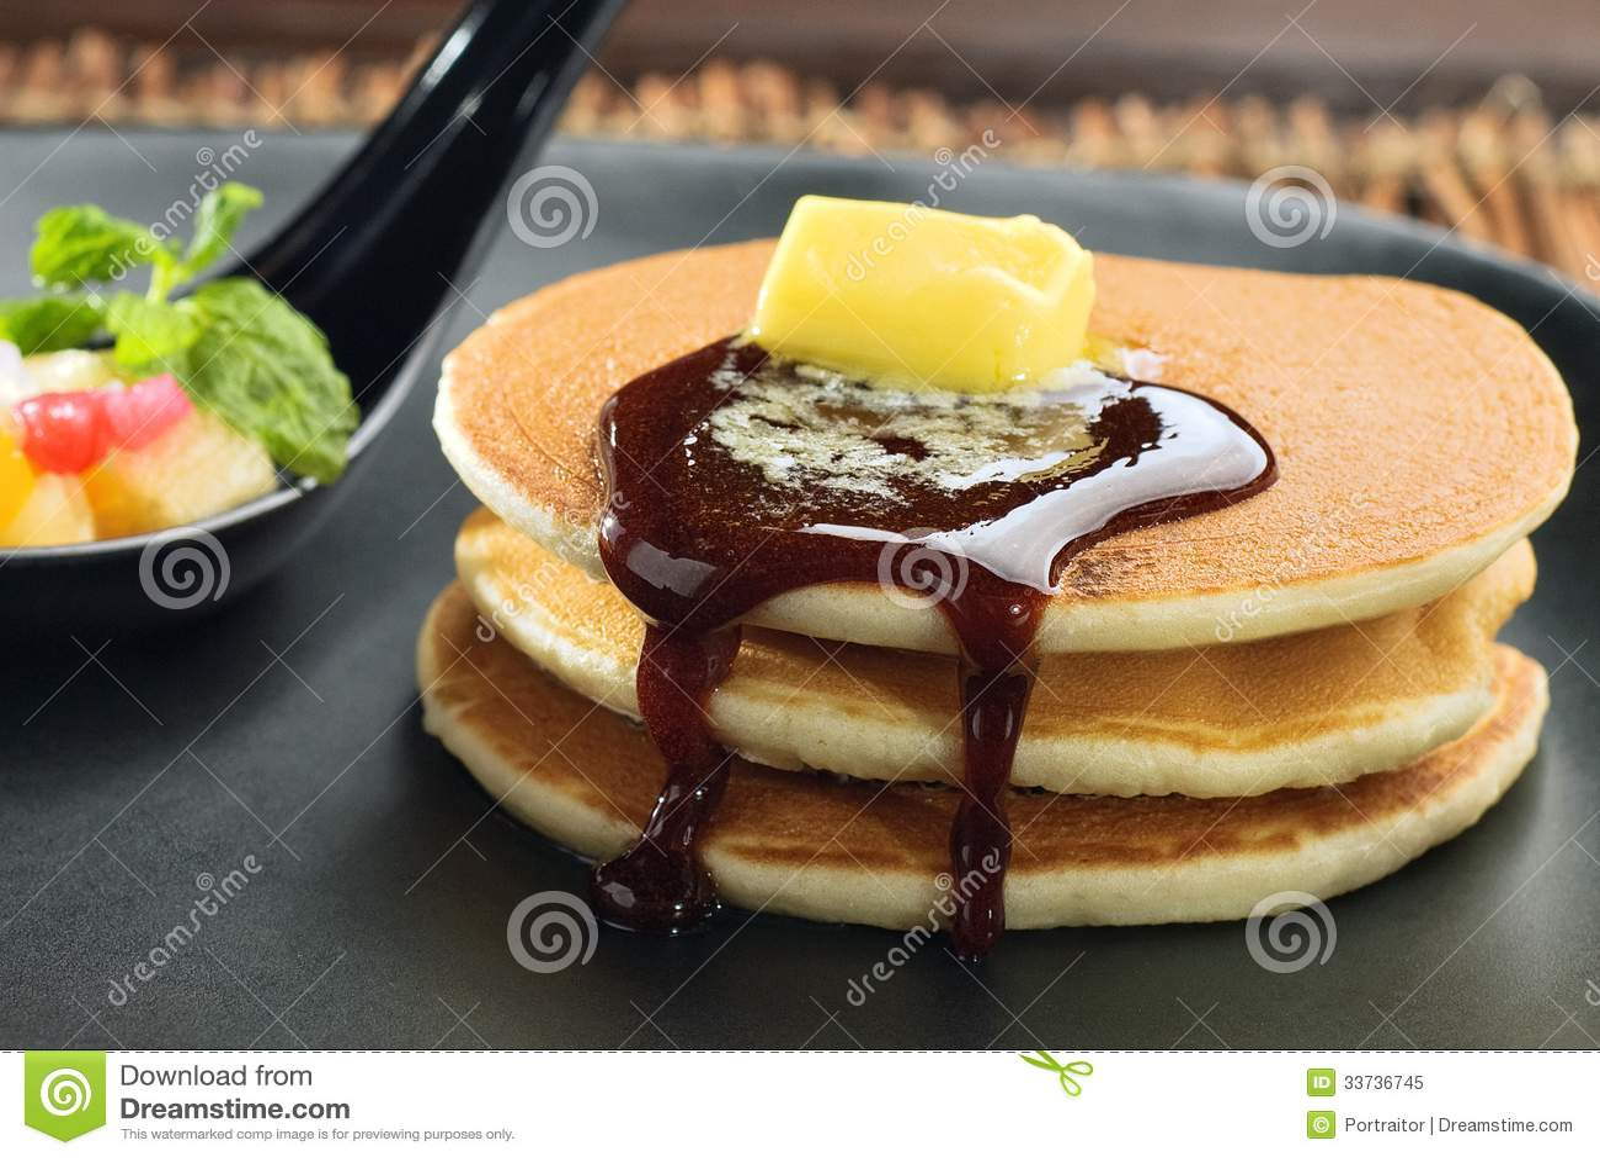 Pancake con miele e burro